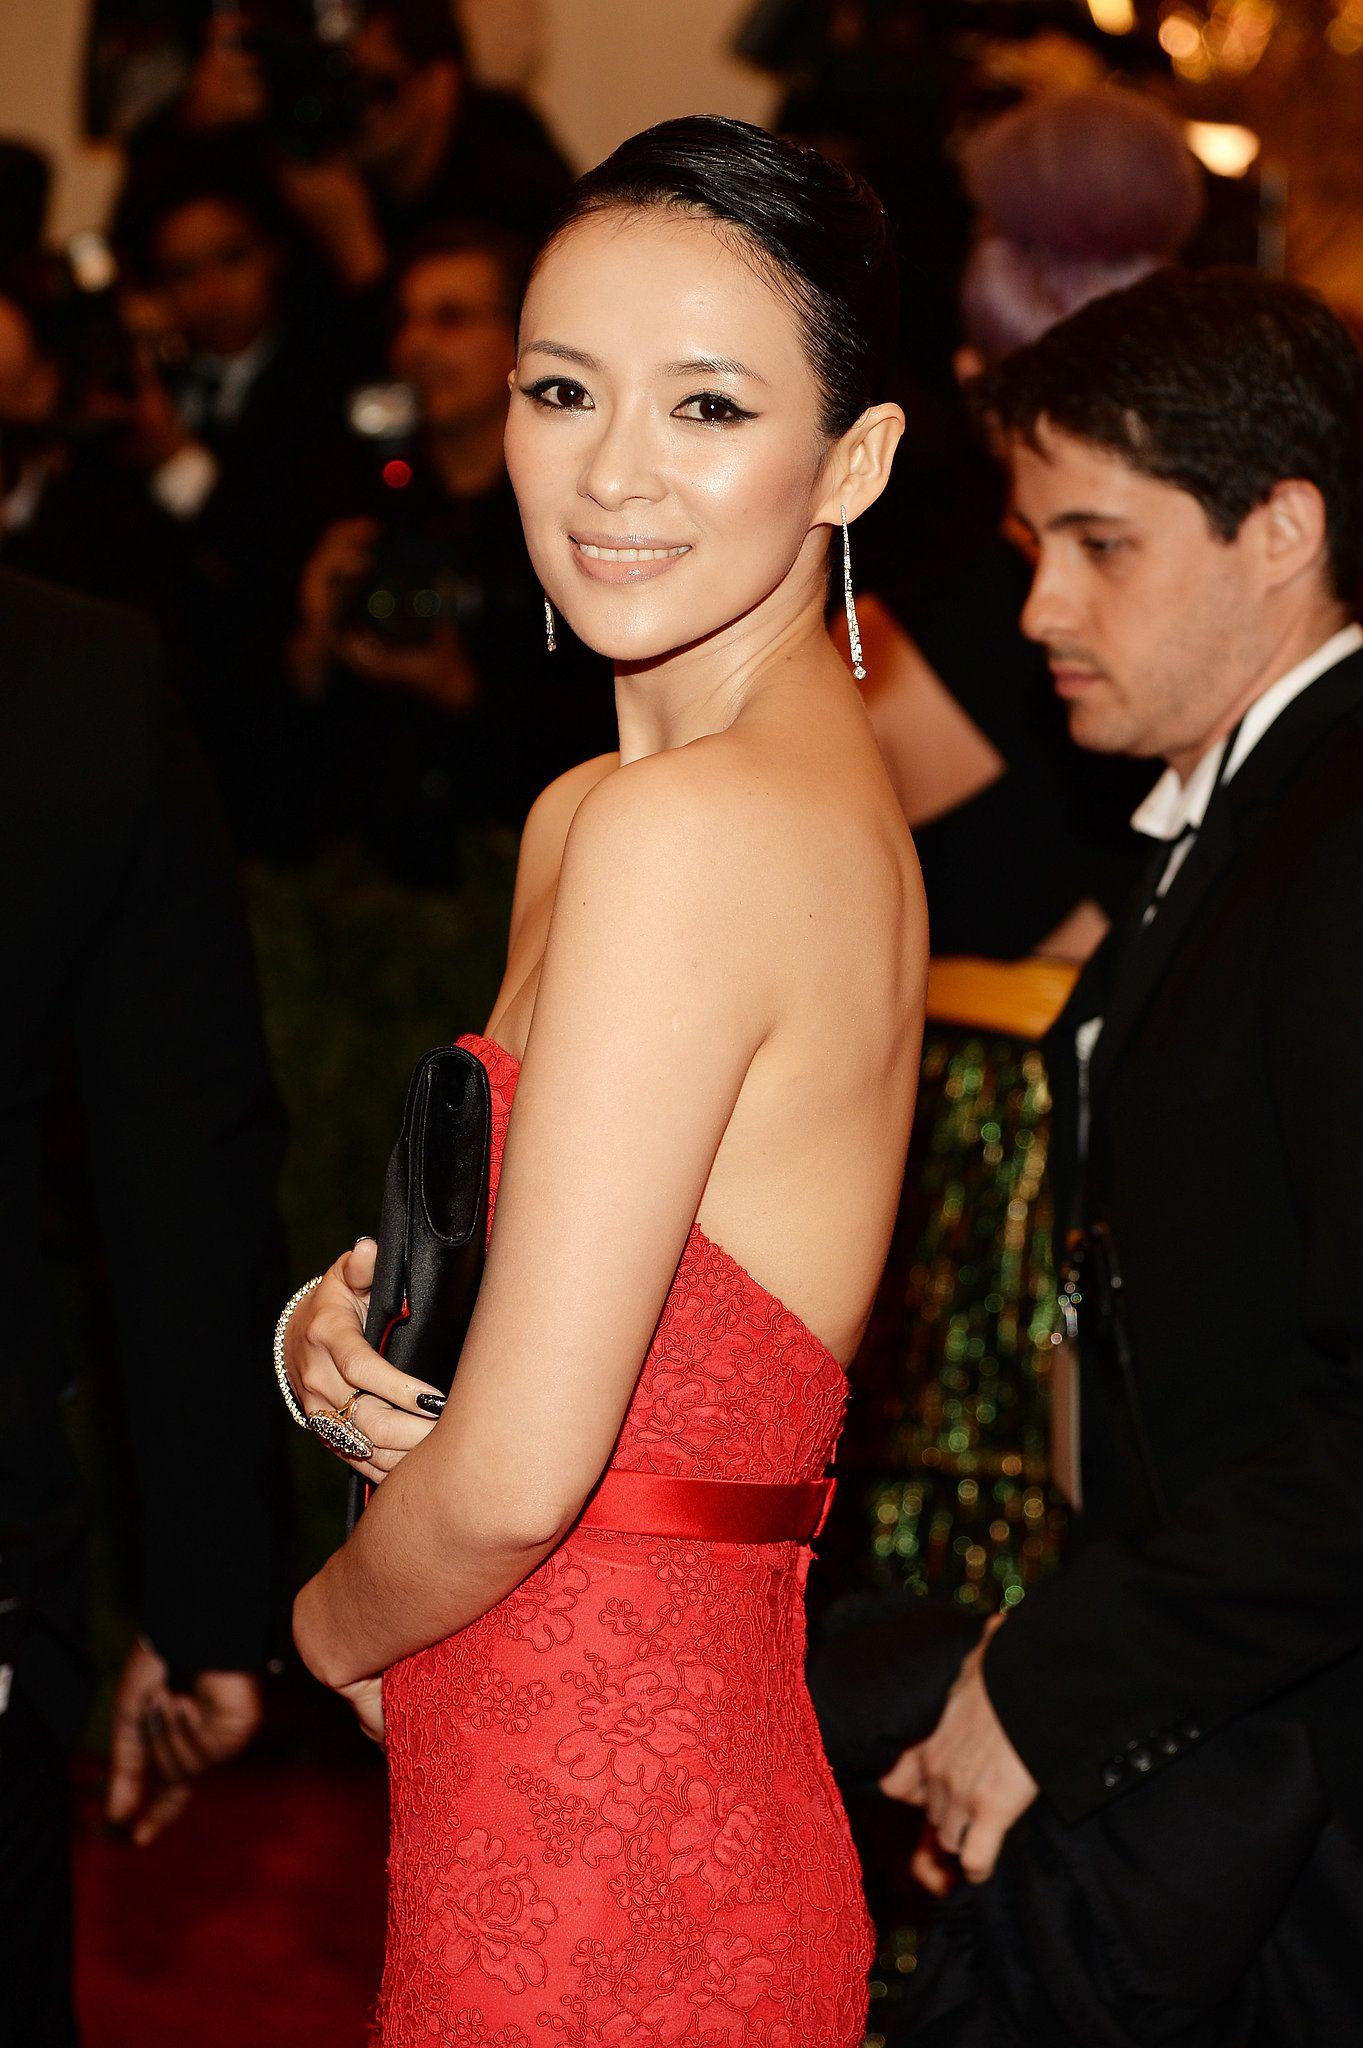 Zhang Ziyi Pink Lipstick - Zhang Ziyi Beauty Looks